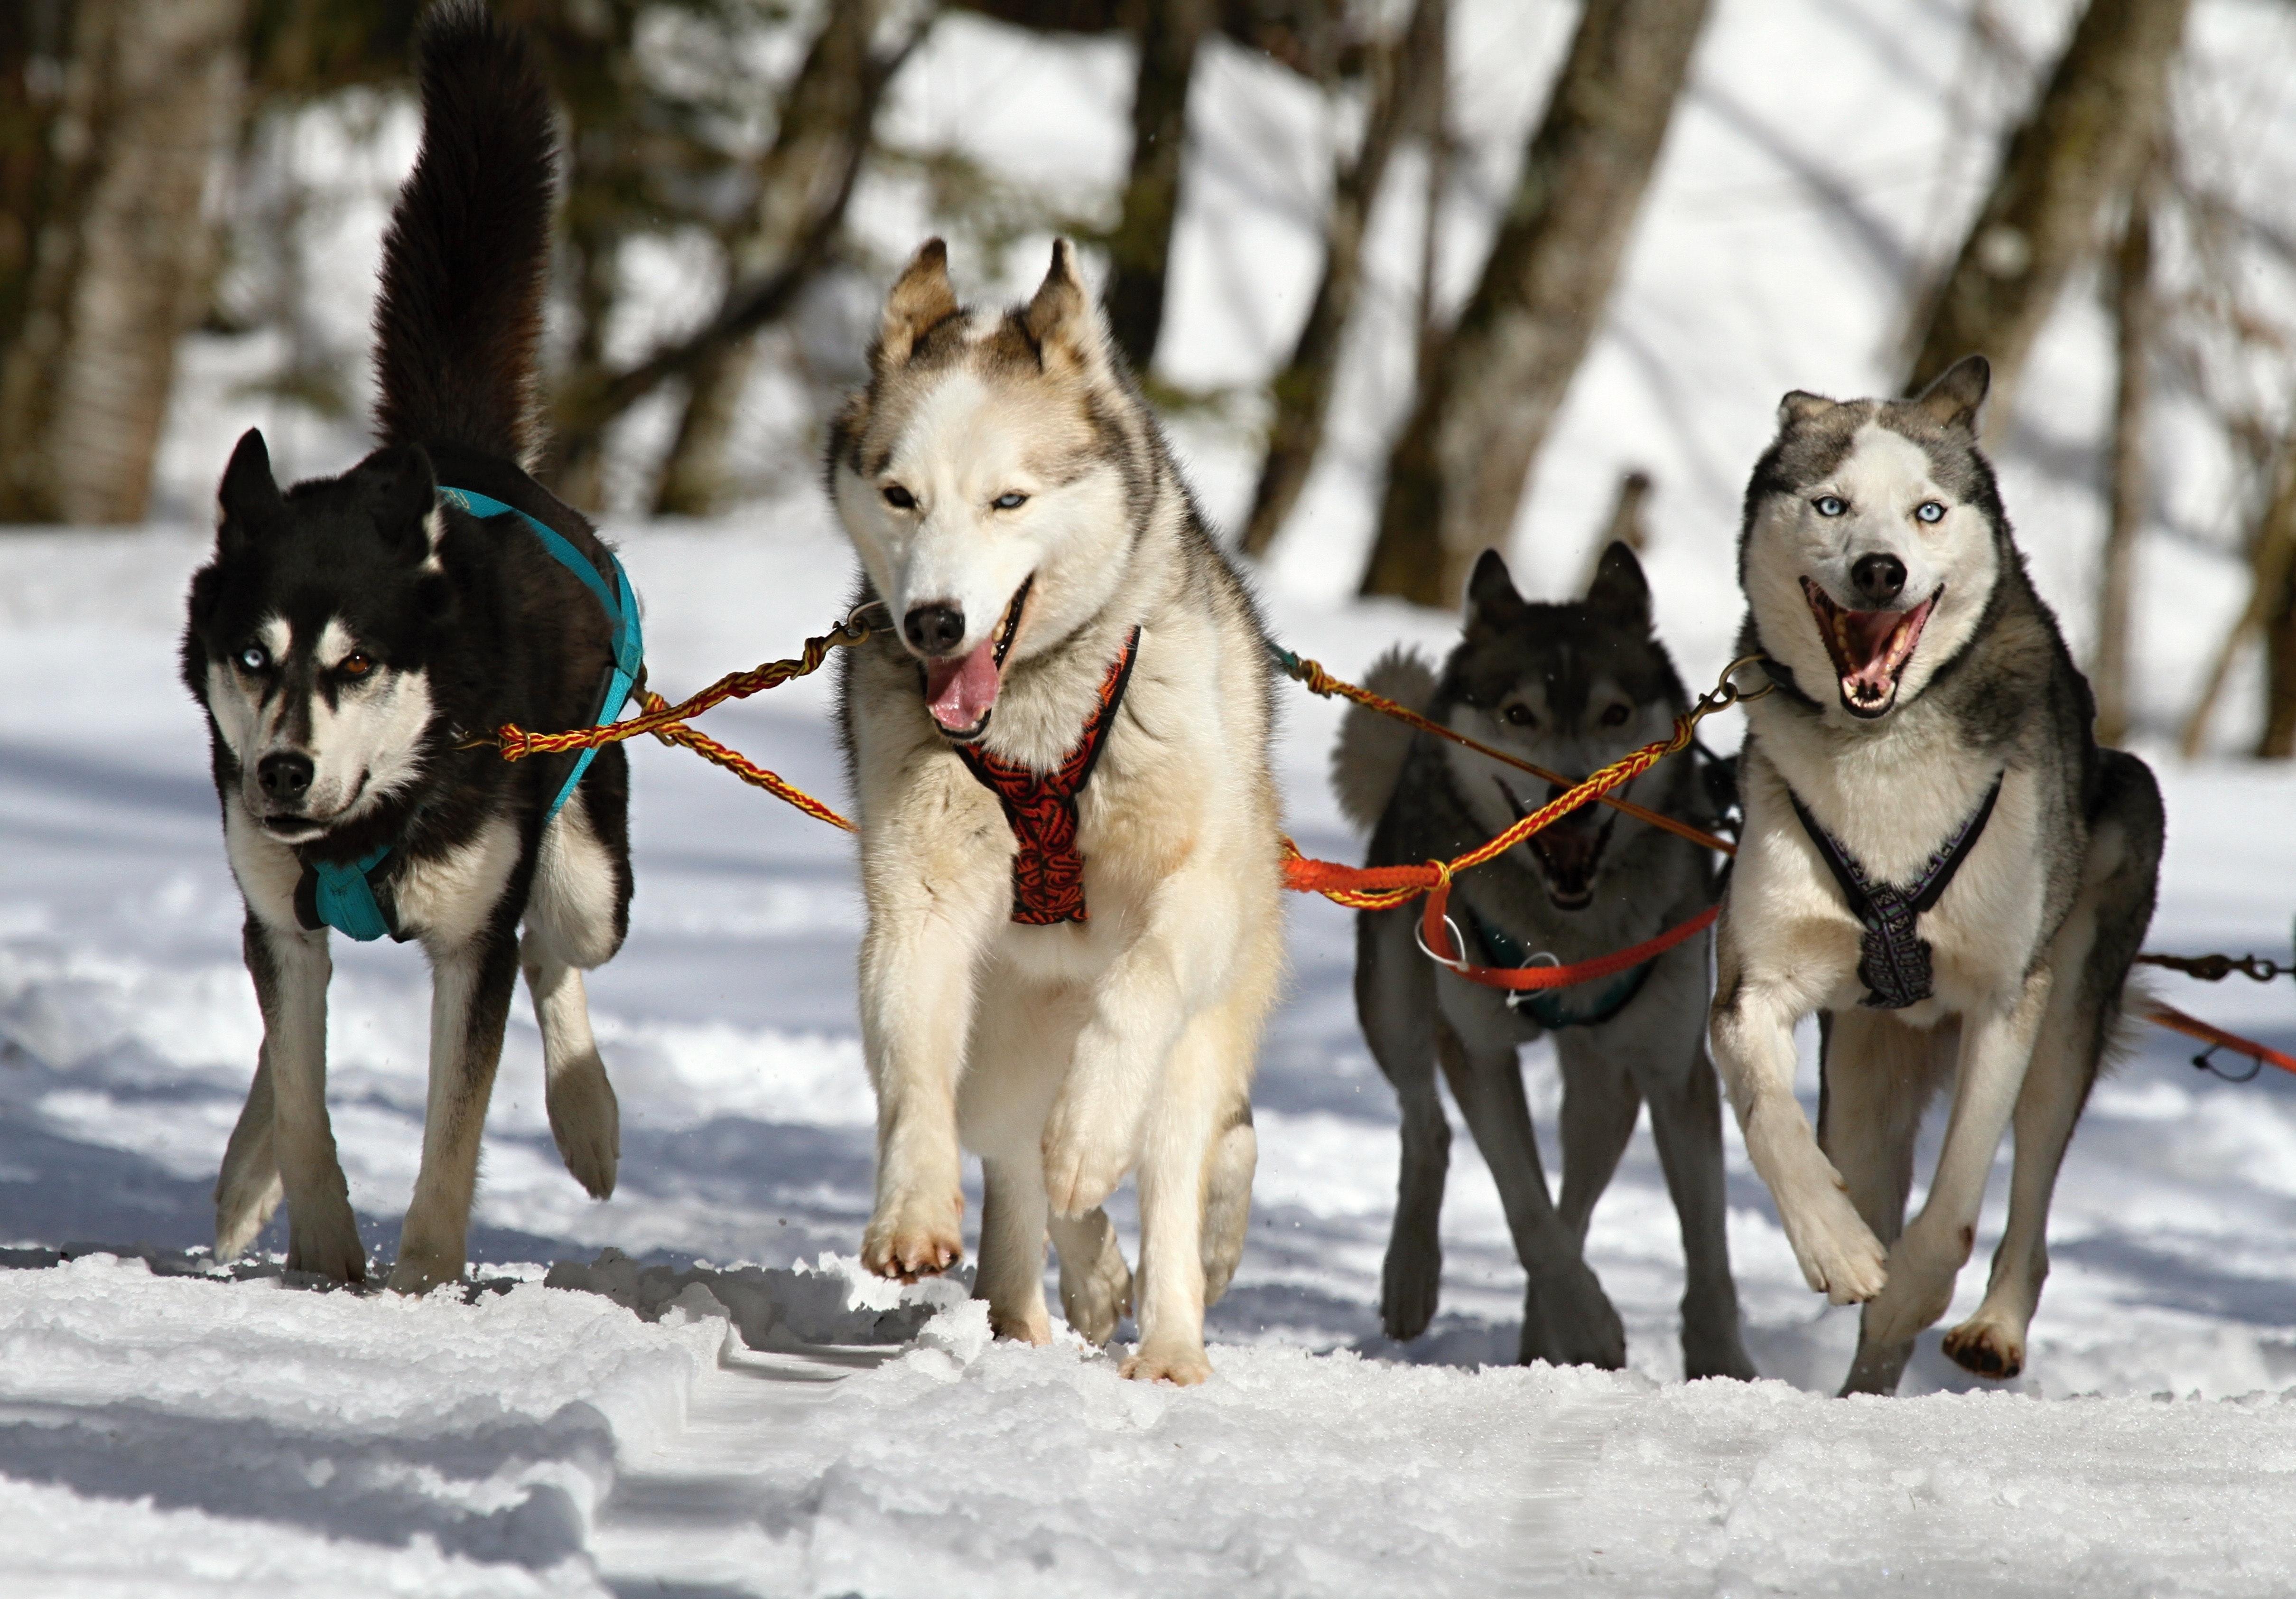 Huskeys Driving Sled Through White Snow, Snow, Winter, Siberian husky, Nature, HQ Photo